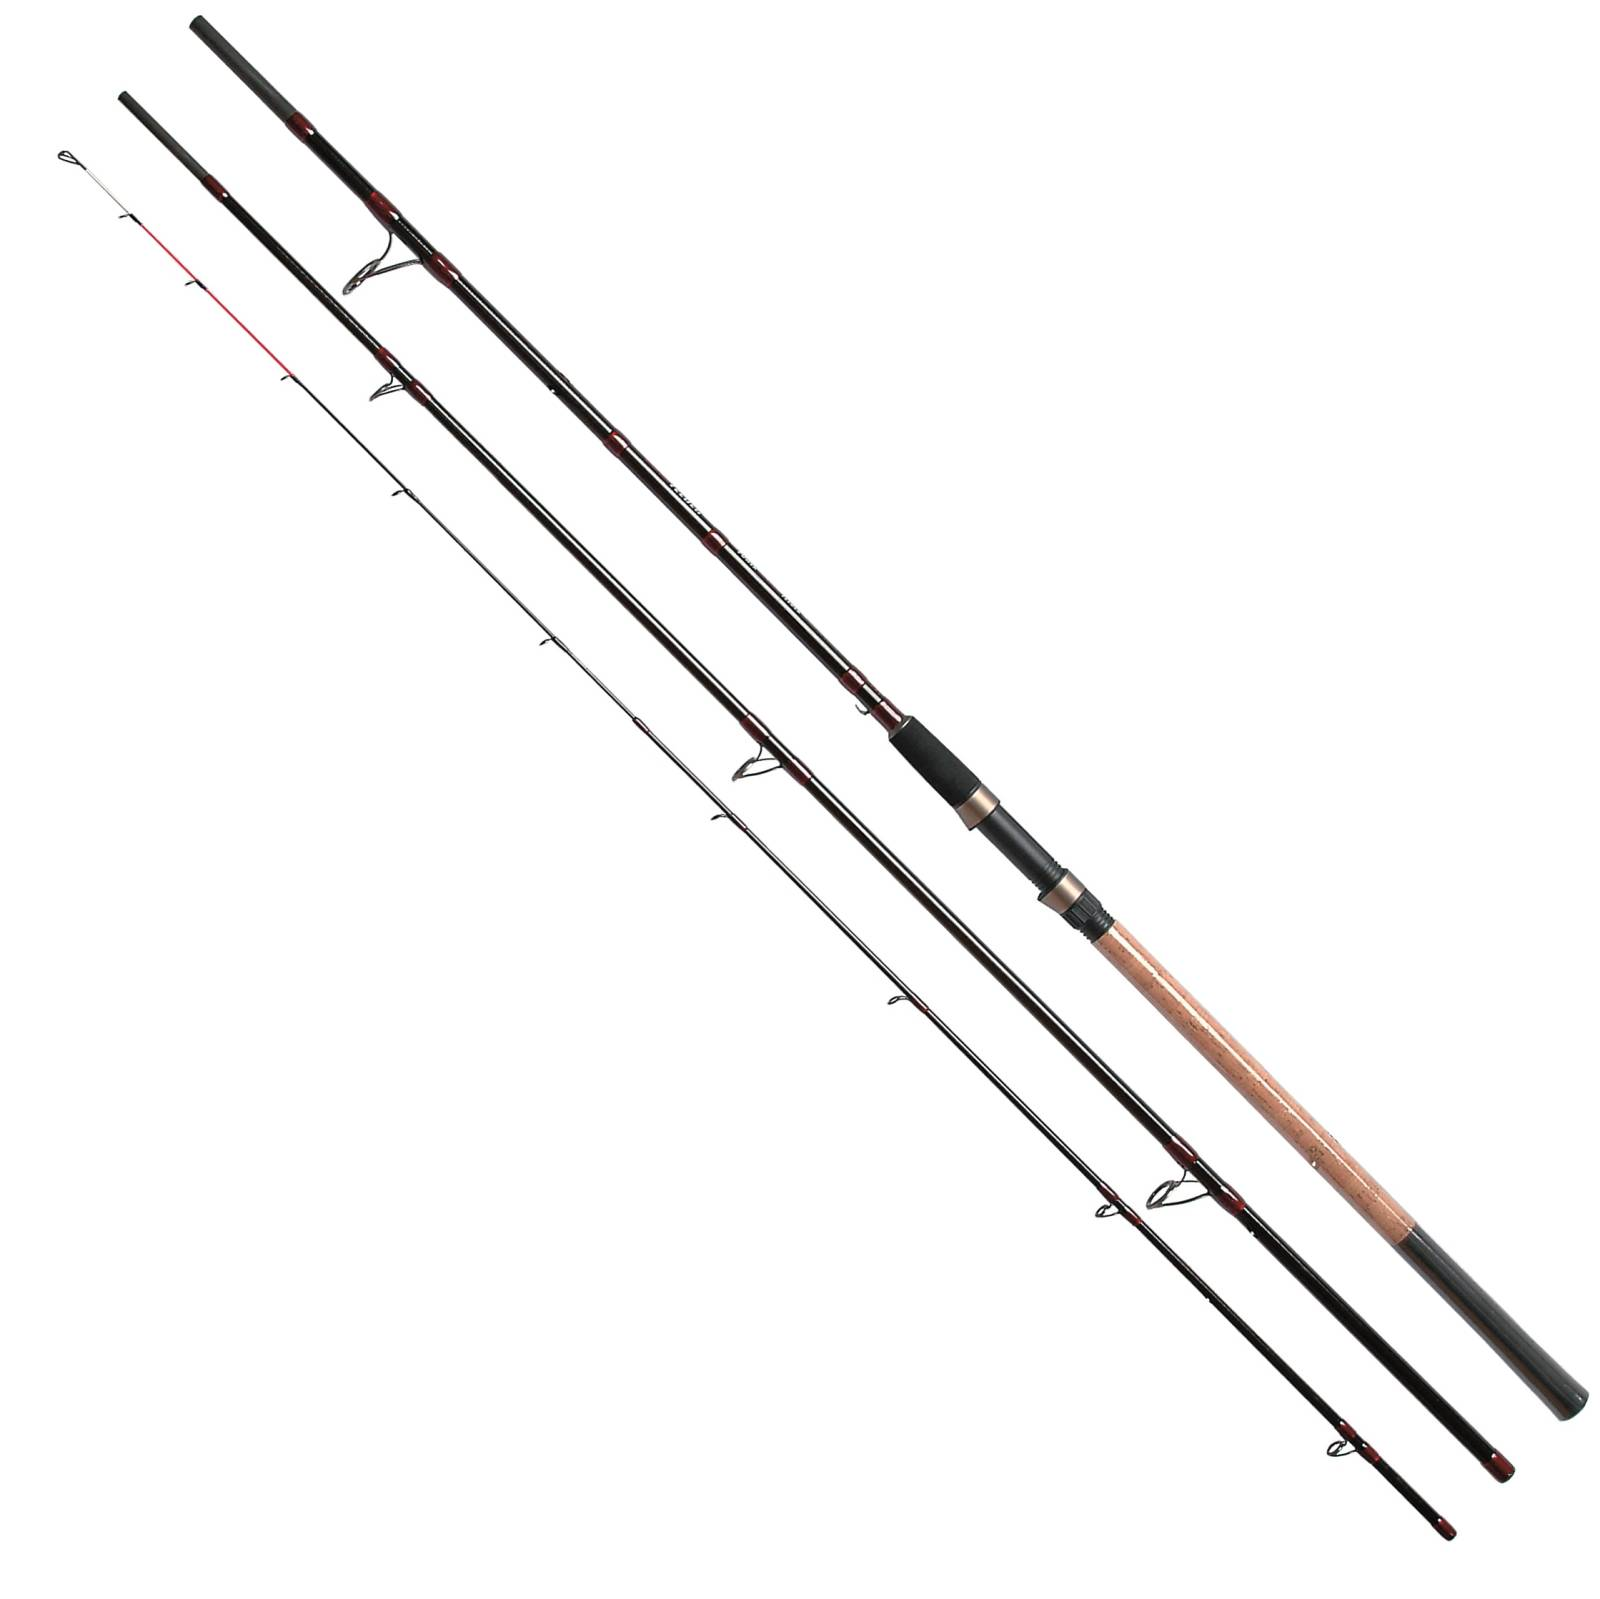 Prut JSA fish Vario Feeder 3,60 m / 140g MH - zvìtšit obrázek